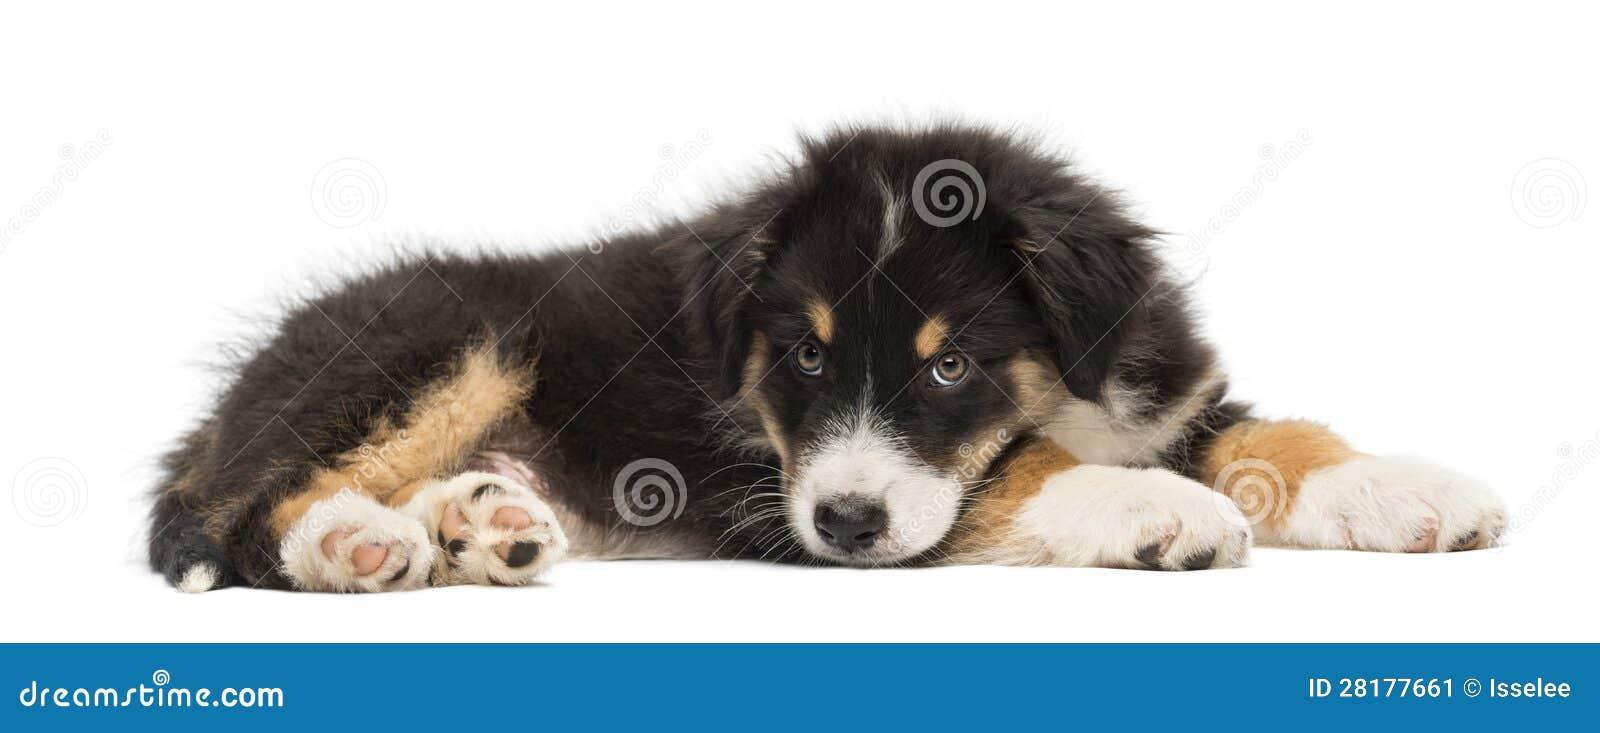 Australian Shepherd Puppy, 2 Months Old, Lying Stock Image - Image ...